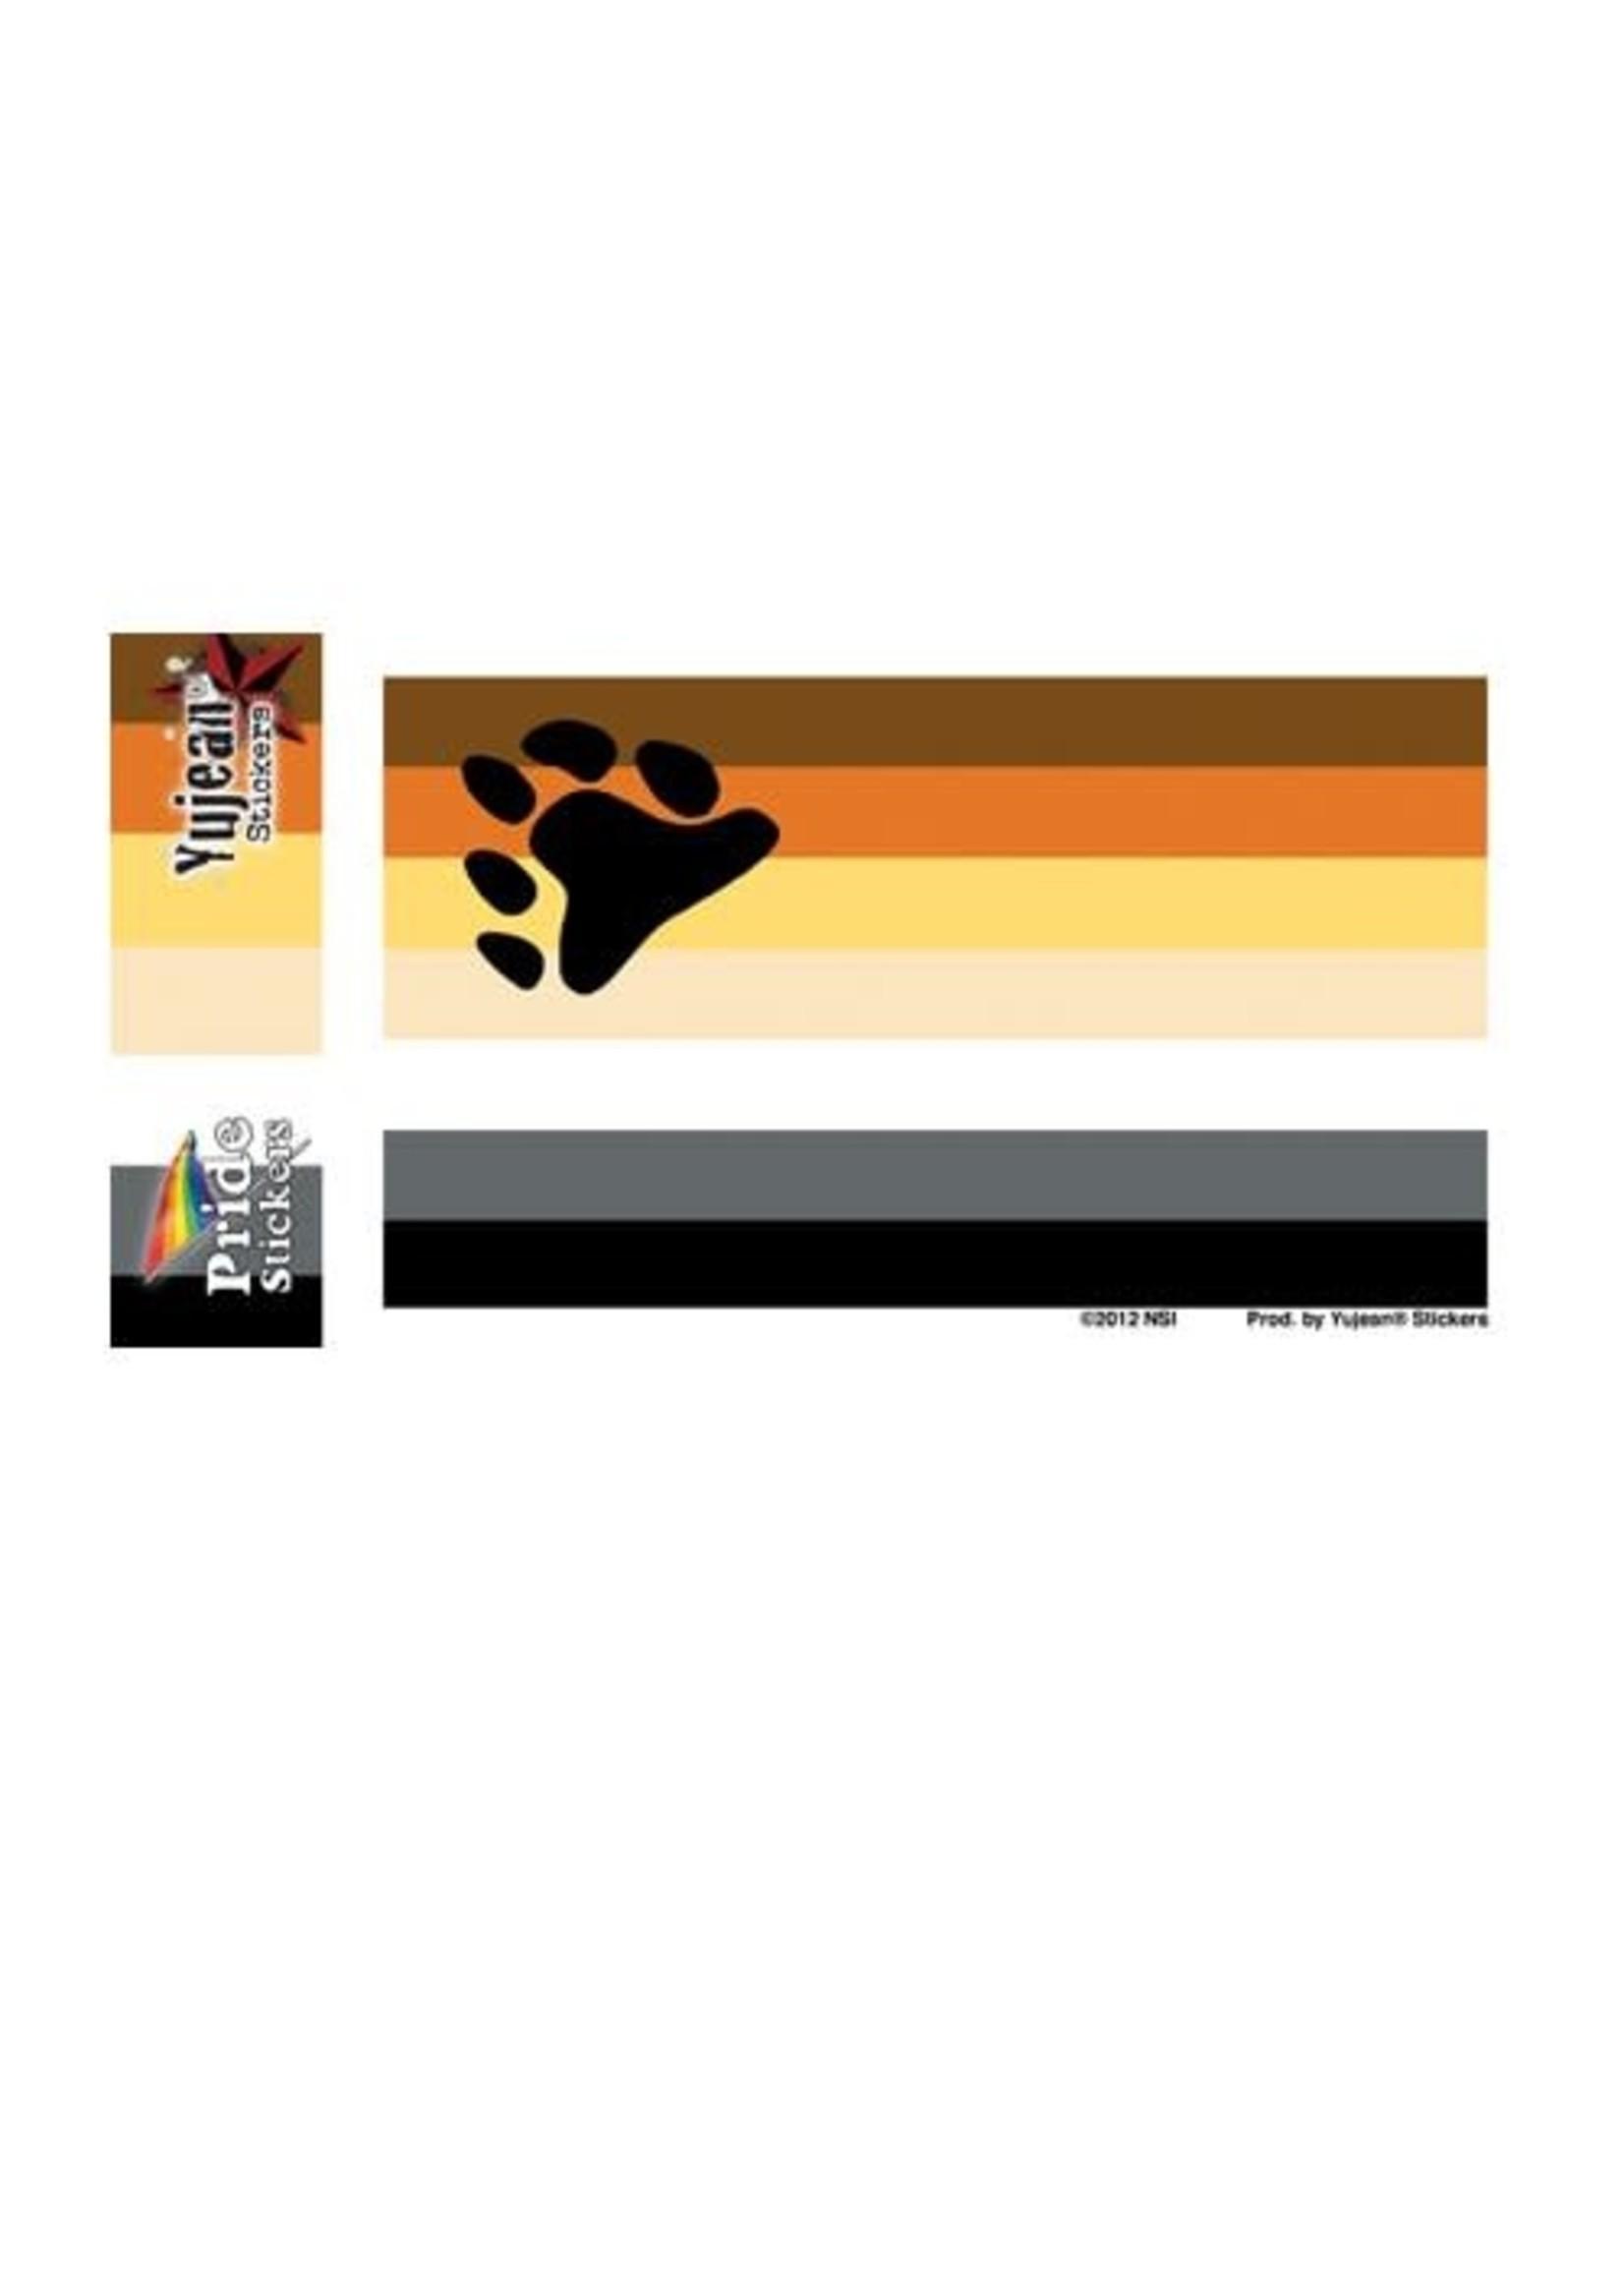 "Bear Flag Sticker 5"" x 3.75"" (NS)"